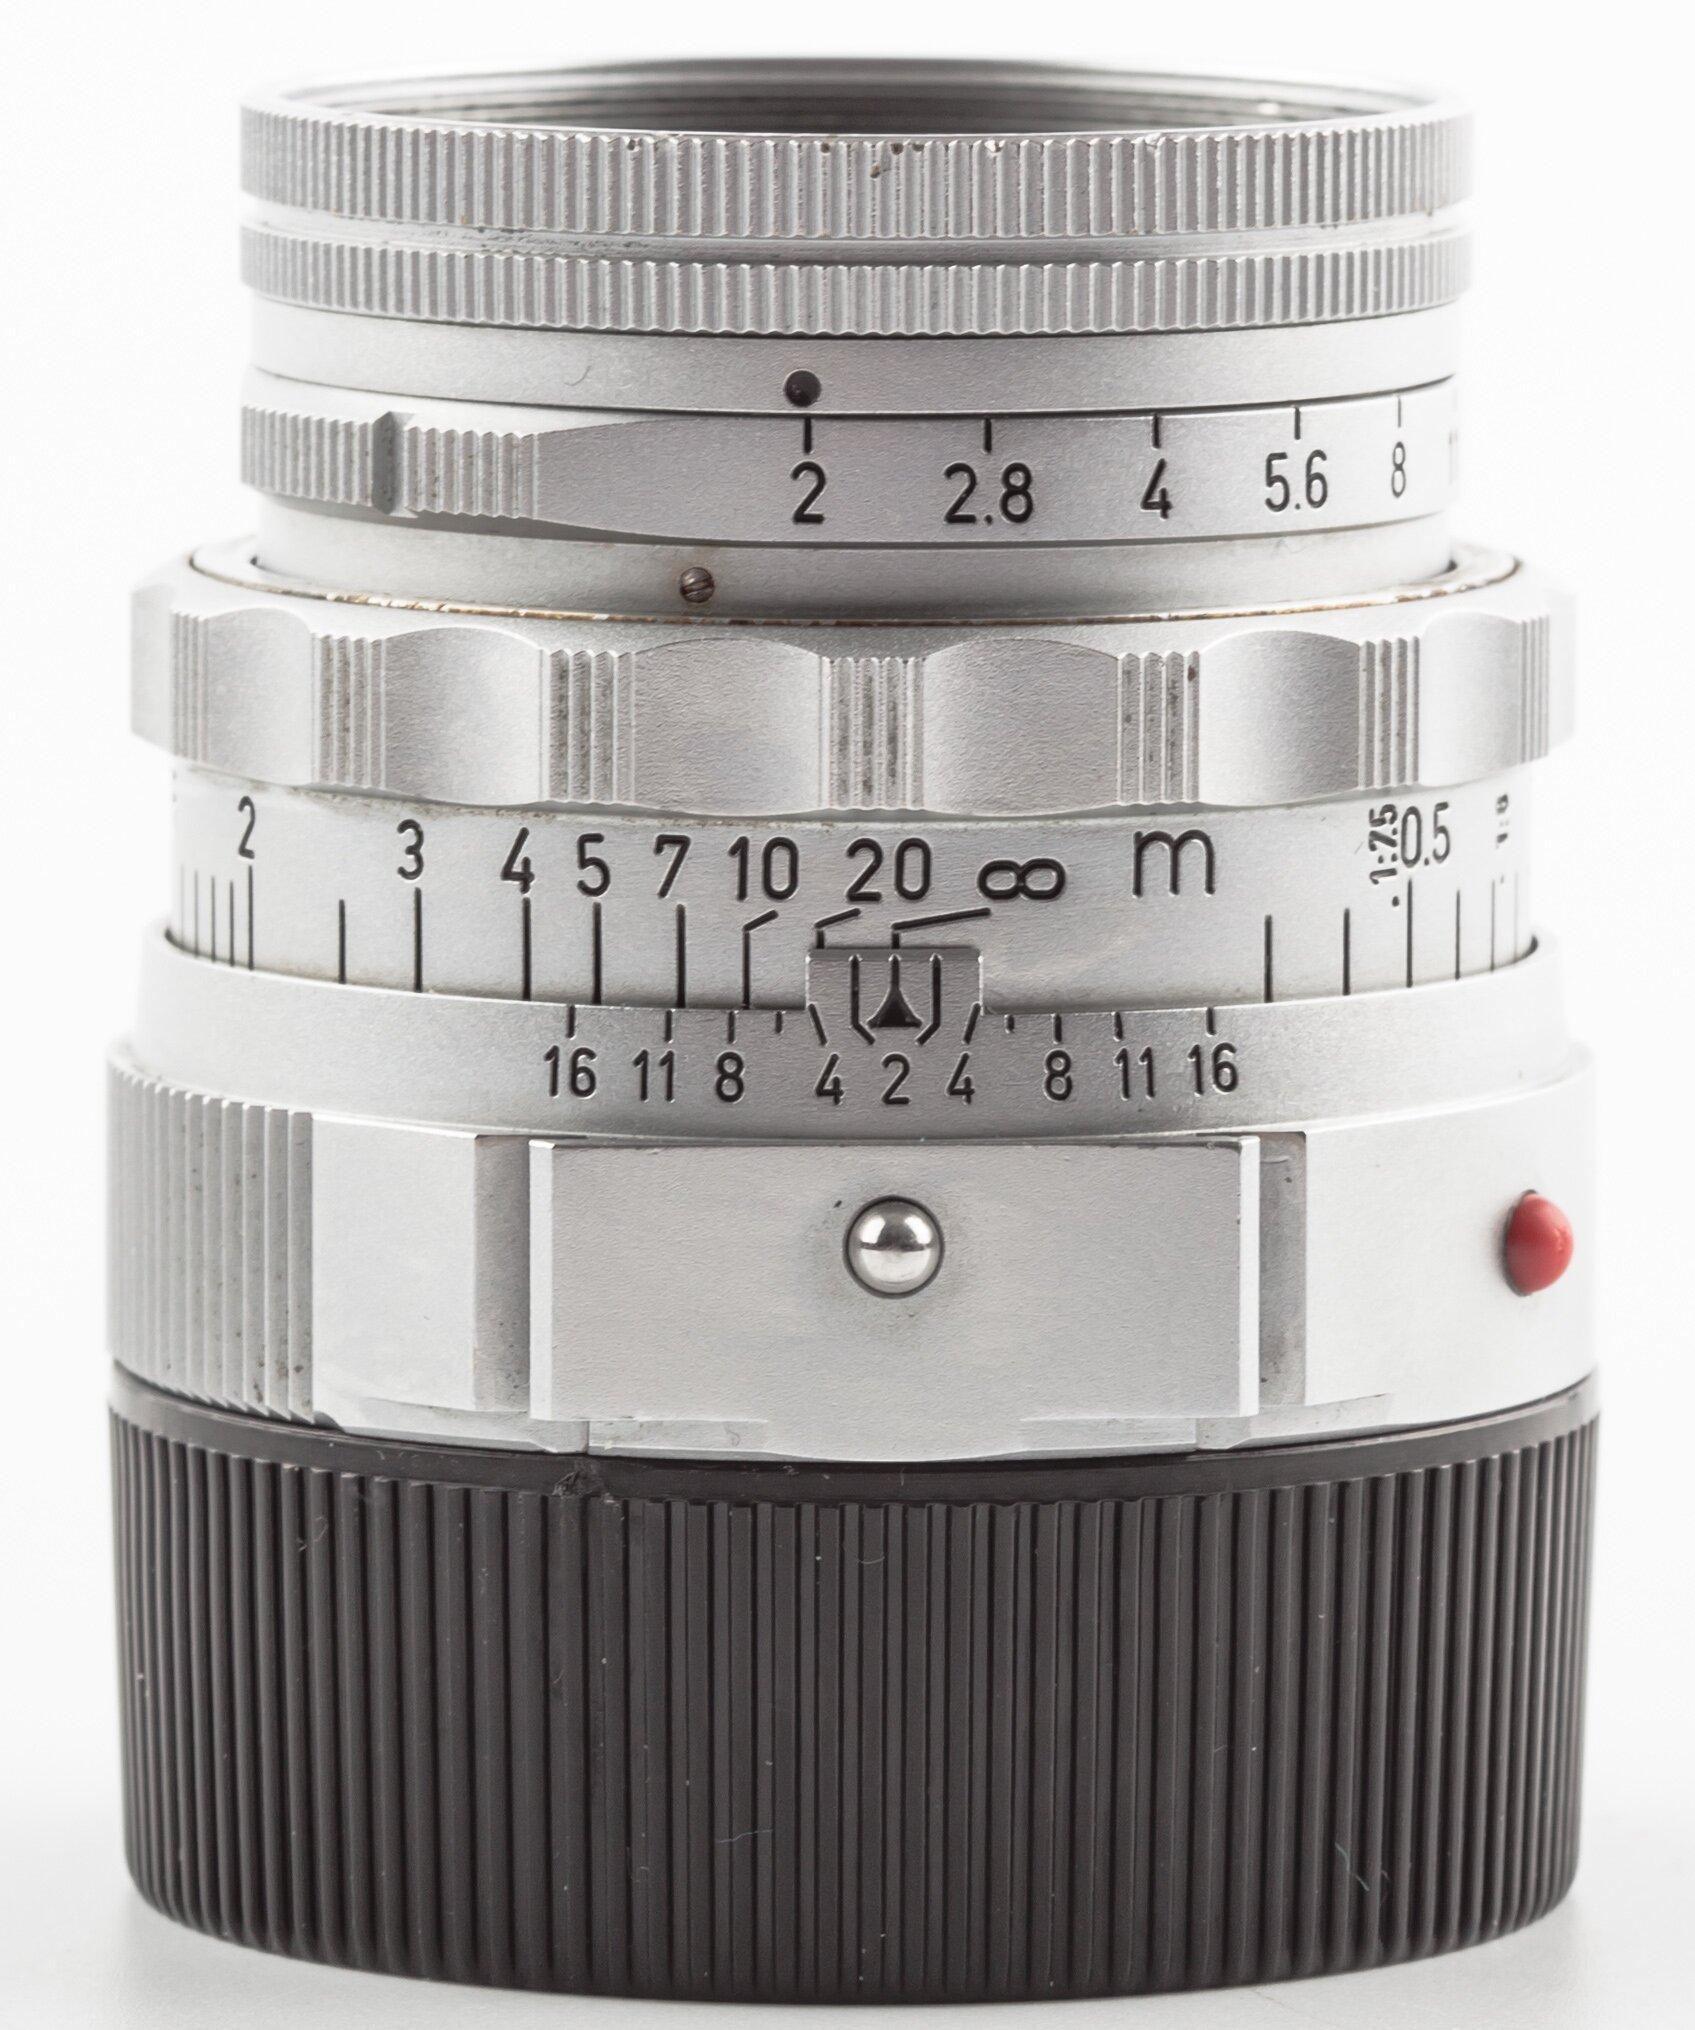 Leitz Leica M Summicron 5cm F2.0 Silver